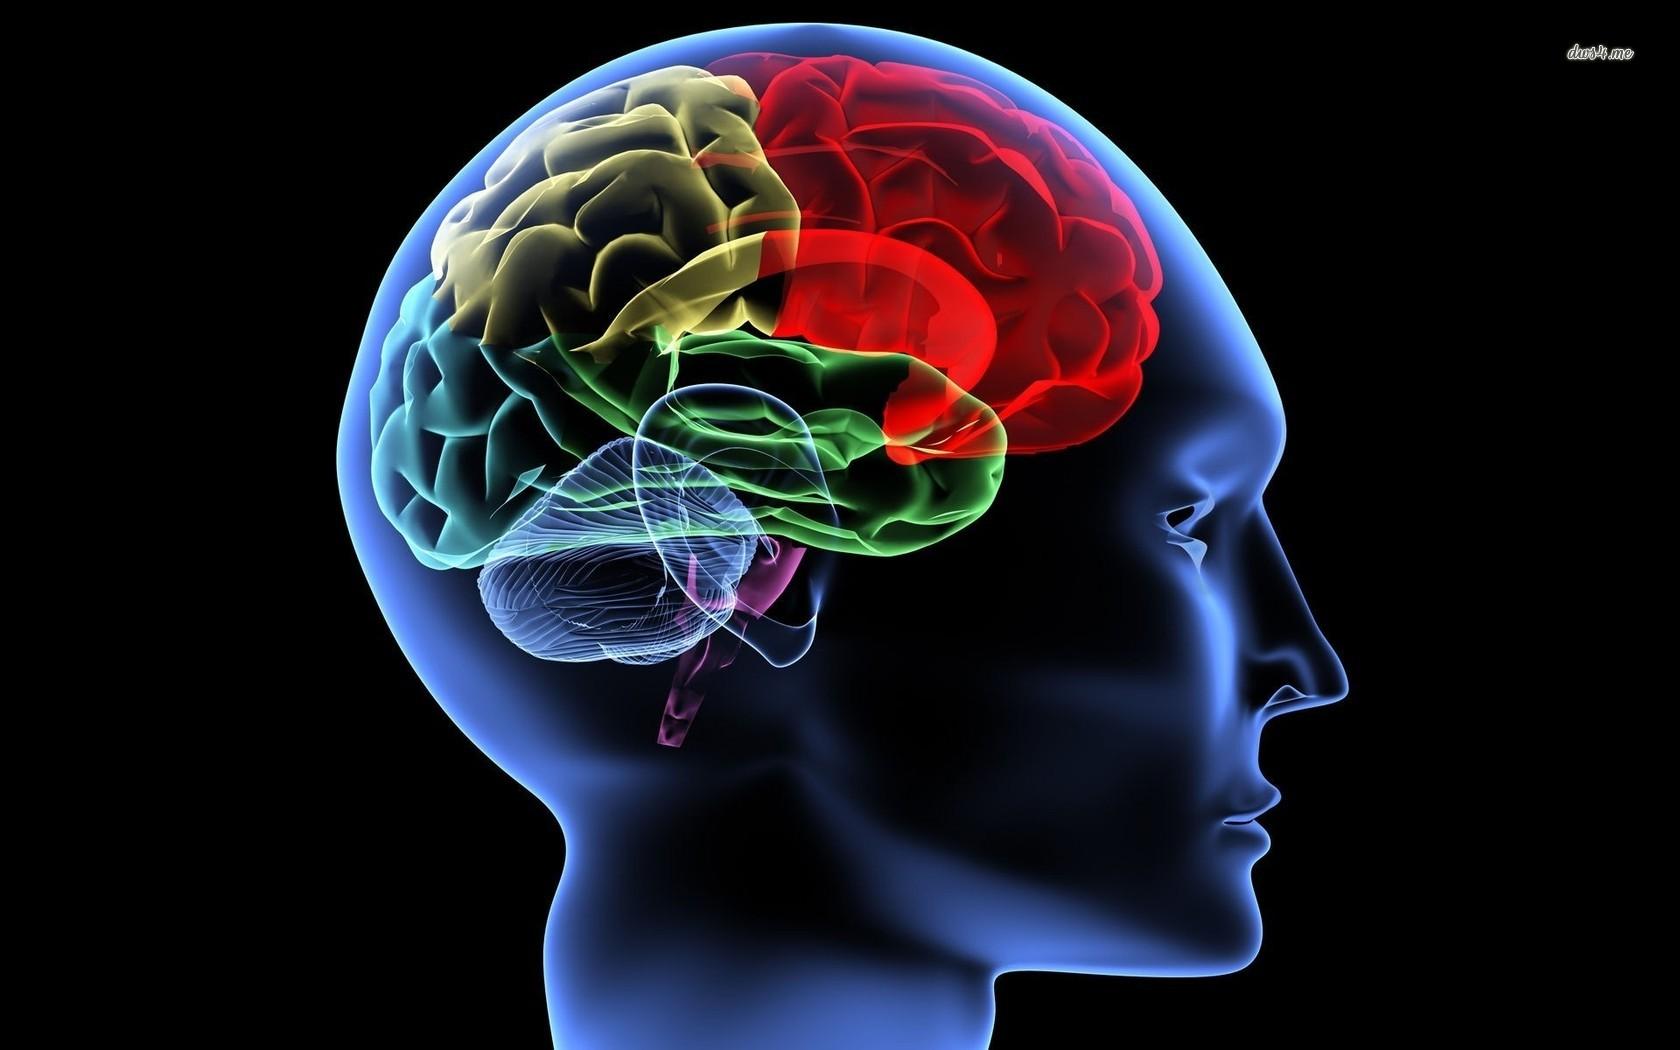 human brain wallpaper 6 brain wallpaper pictures